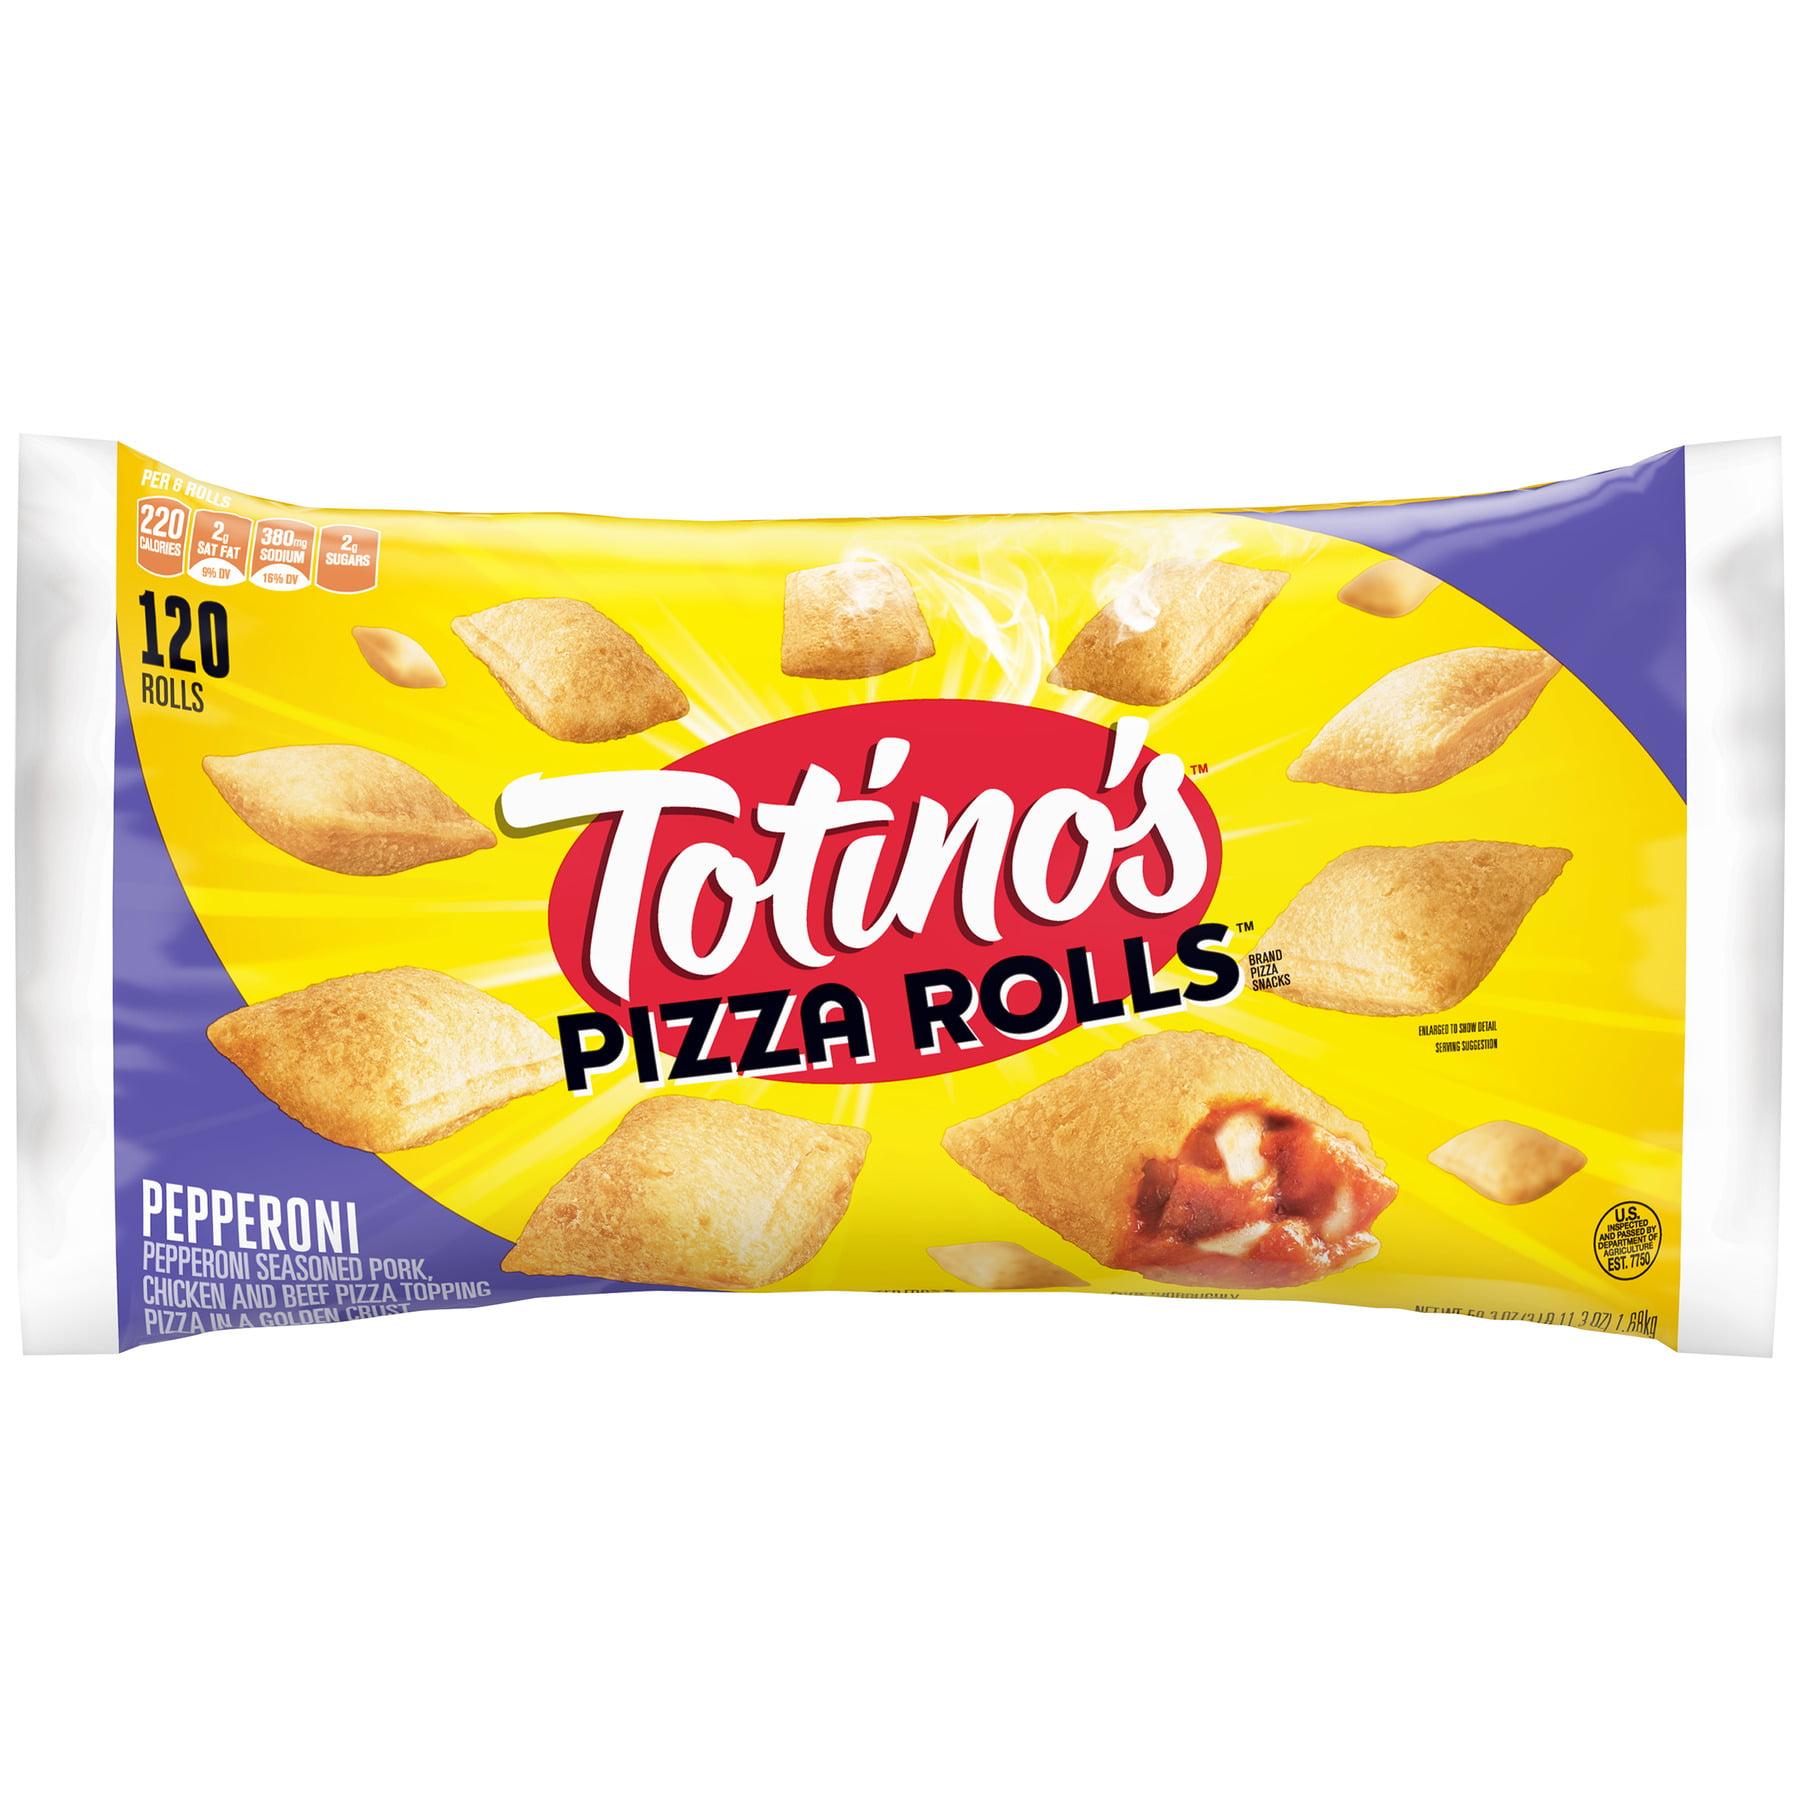 totino's pepperoni pizza rolls, 120 ct, 59.3 oz bag - walmart